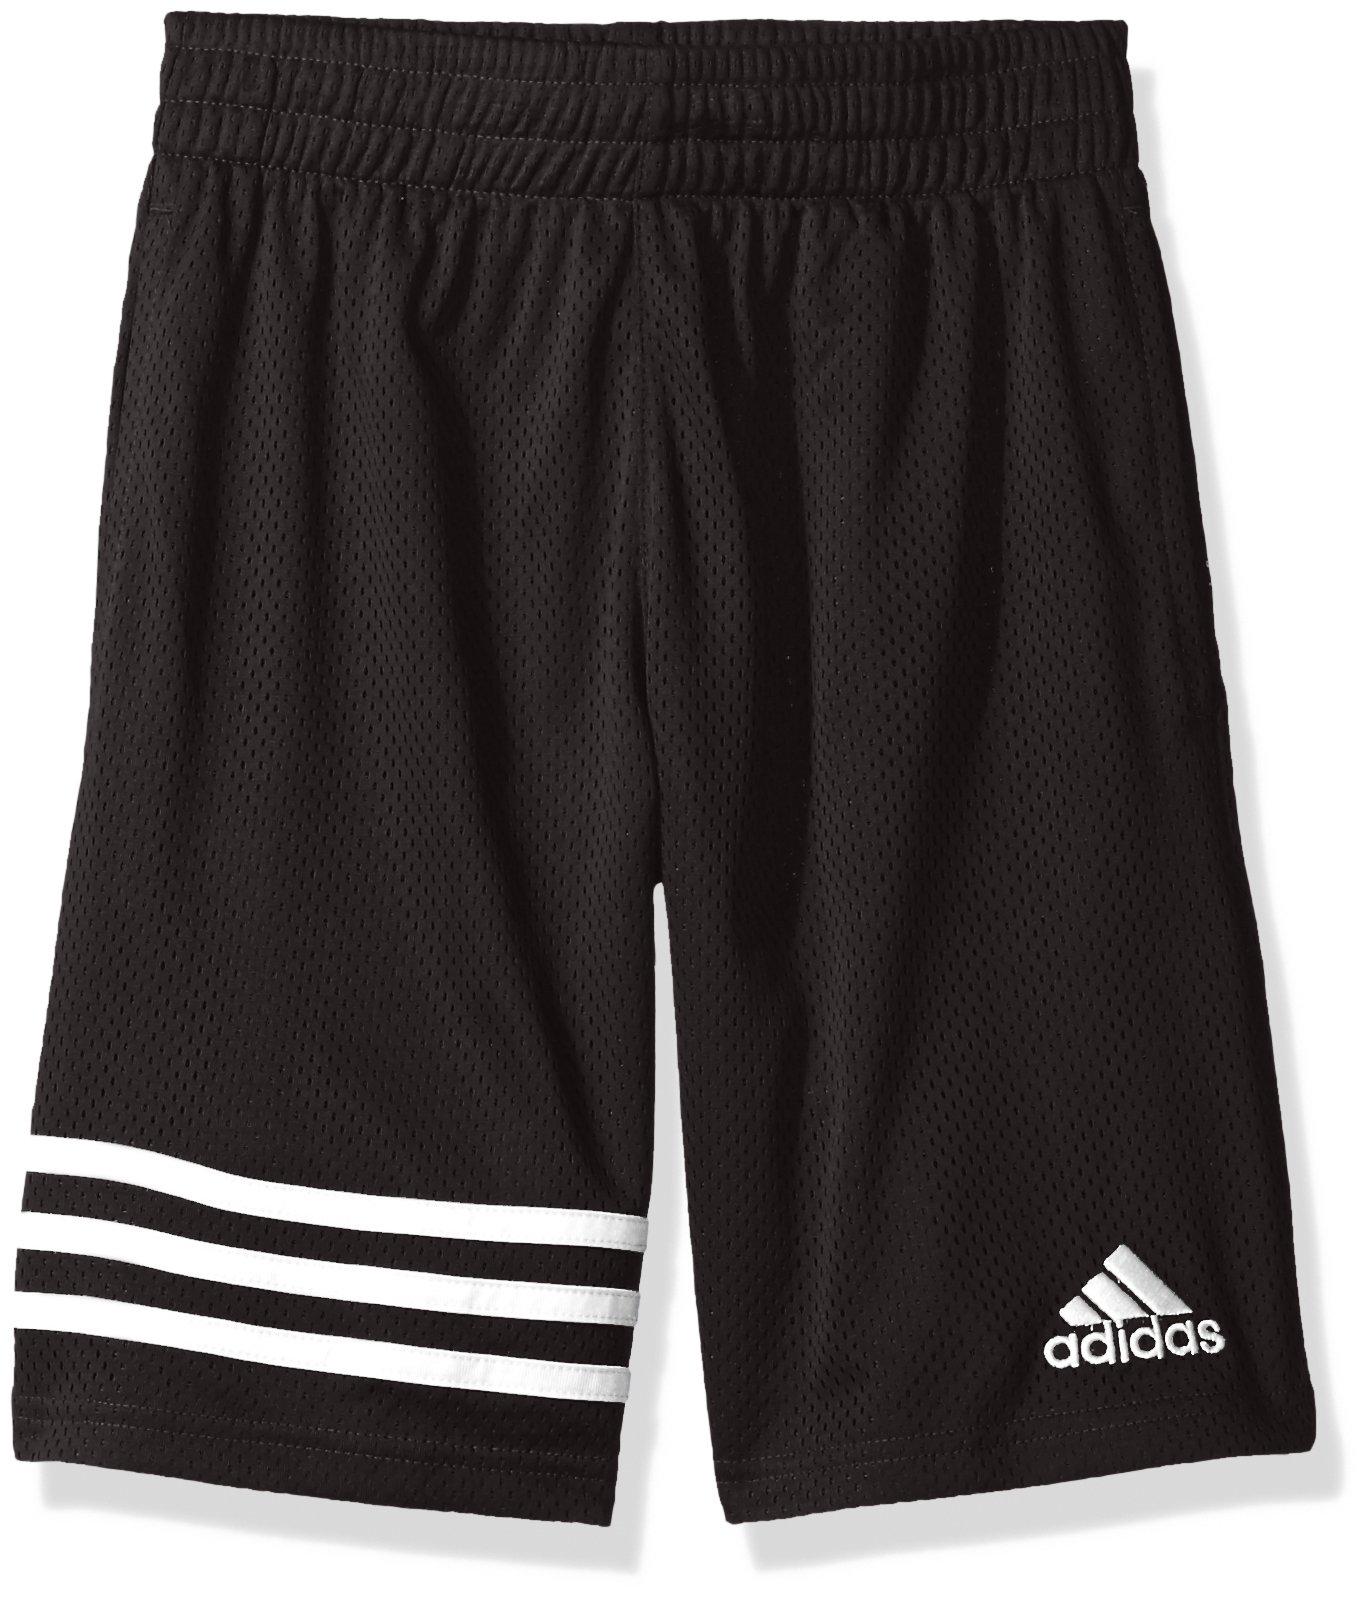 adidas Big Boys' Athletic Short, Defender Caviar Black, S